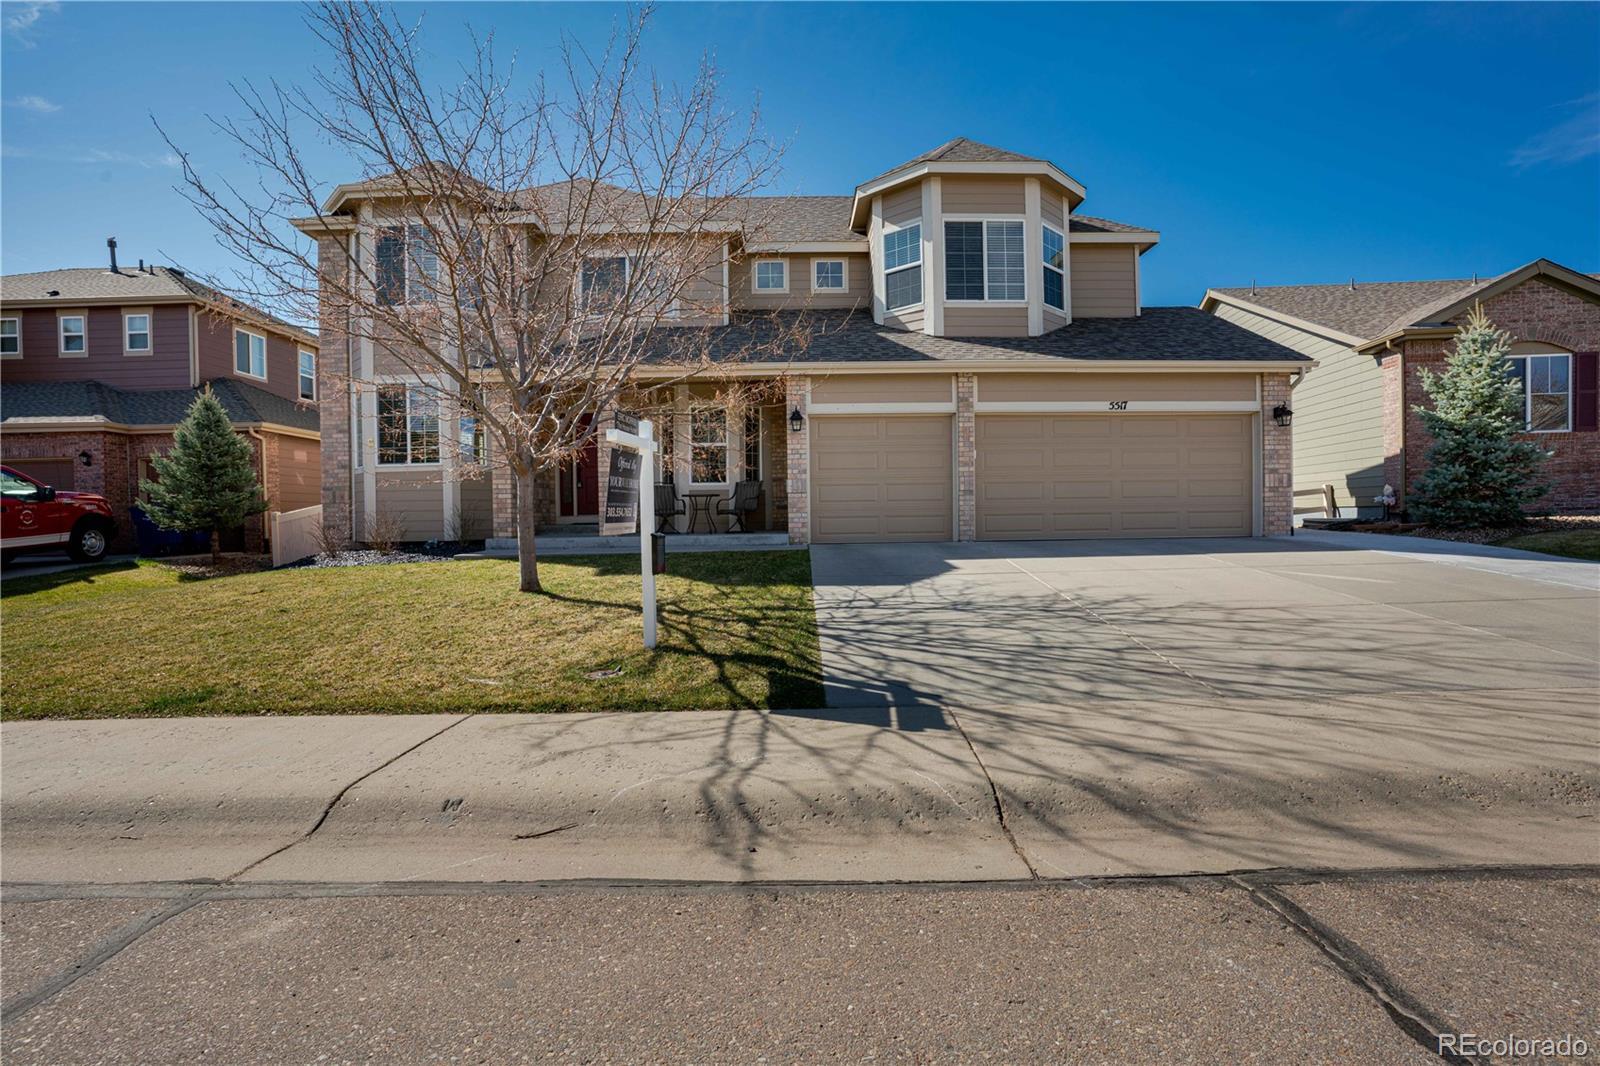 5517 Morgan Way, Frederick, CO 80504 - Frederick, CO real estate listing